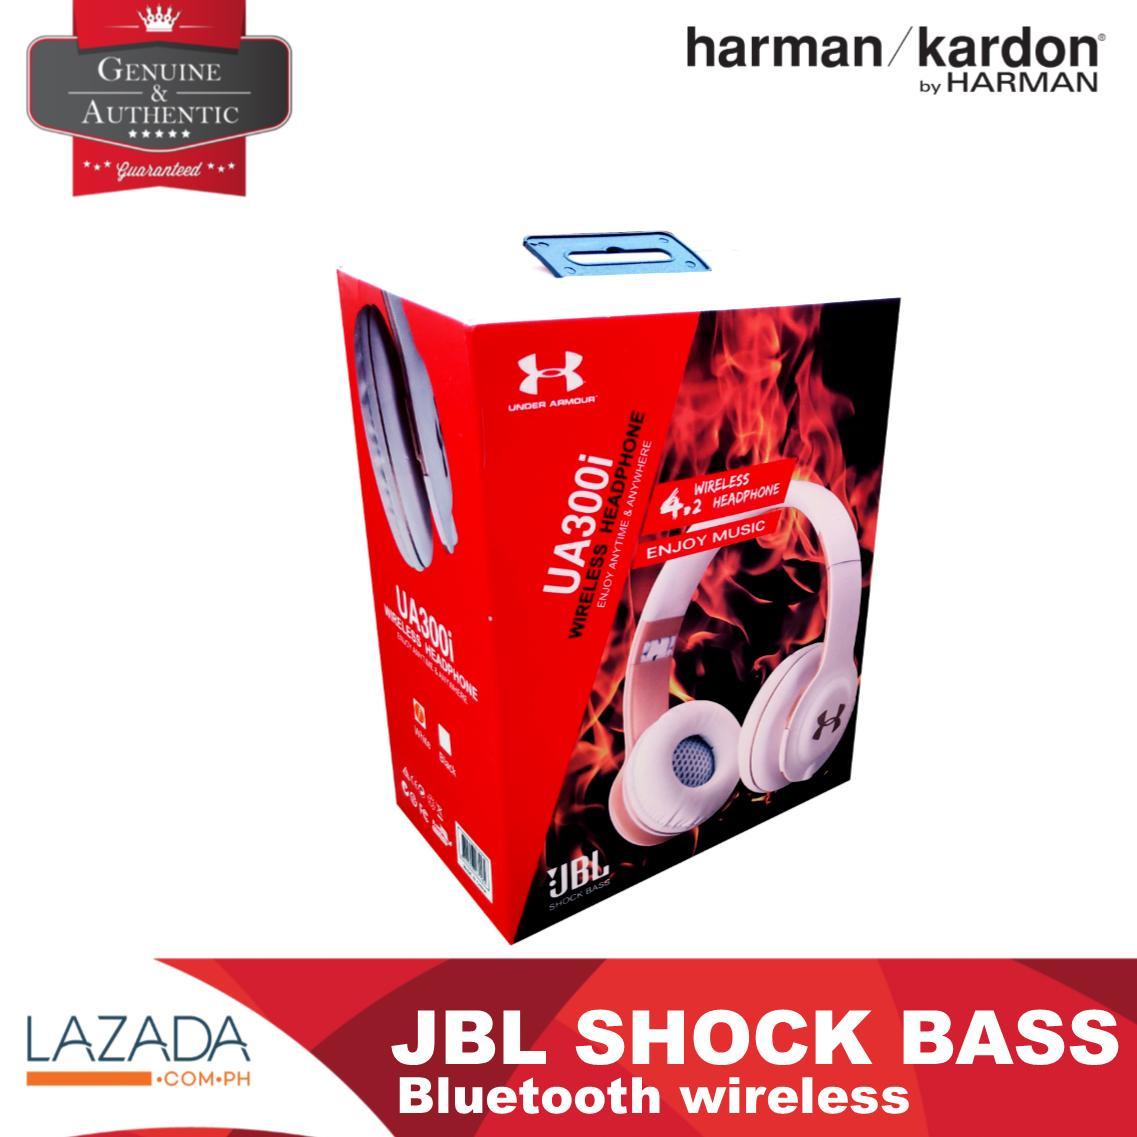 Harman Kardon Philippines: Harman Kardon price list - Harman Kardon